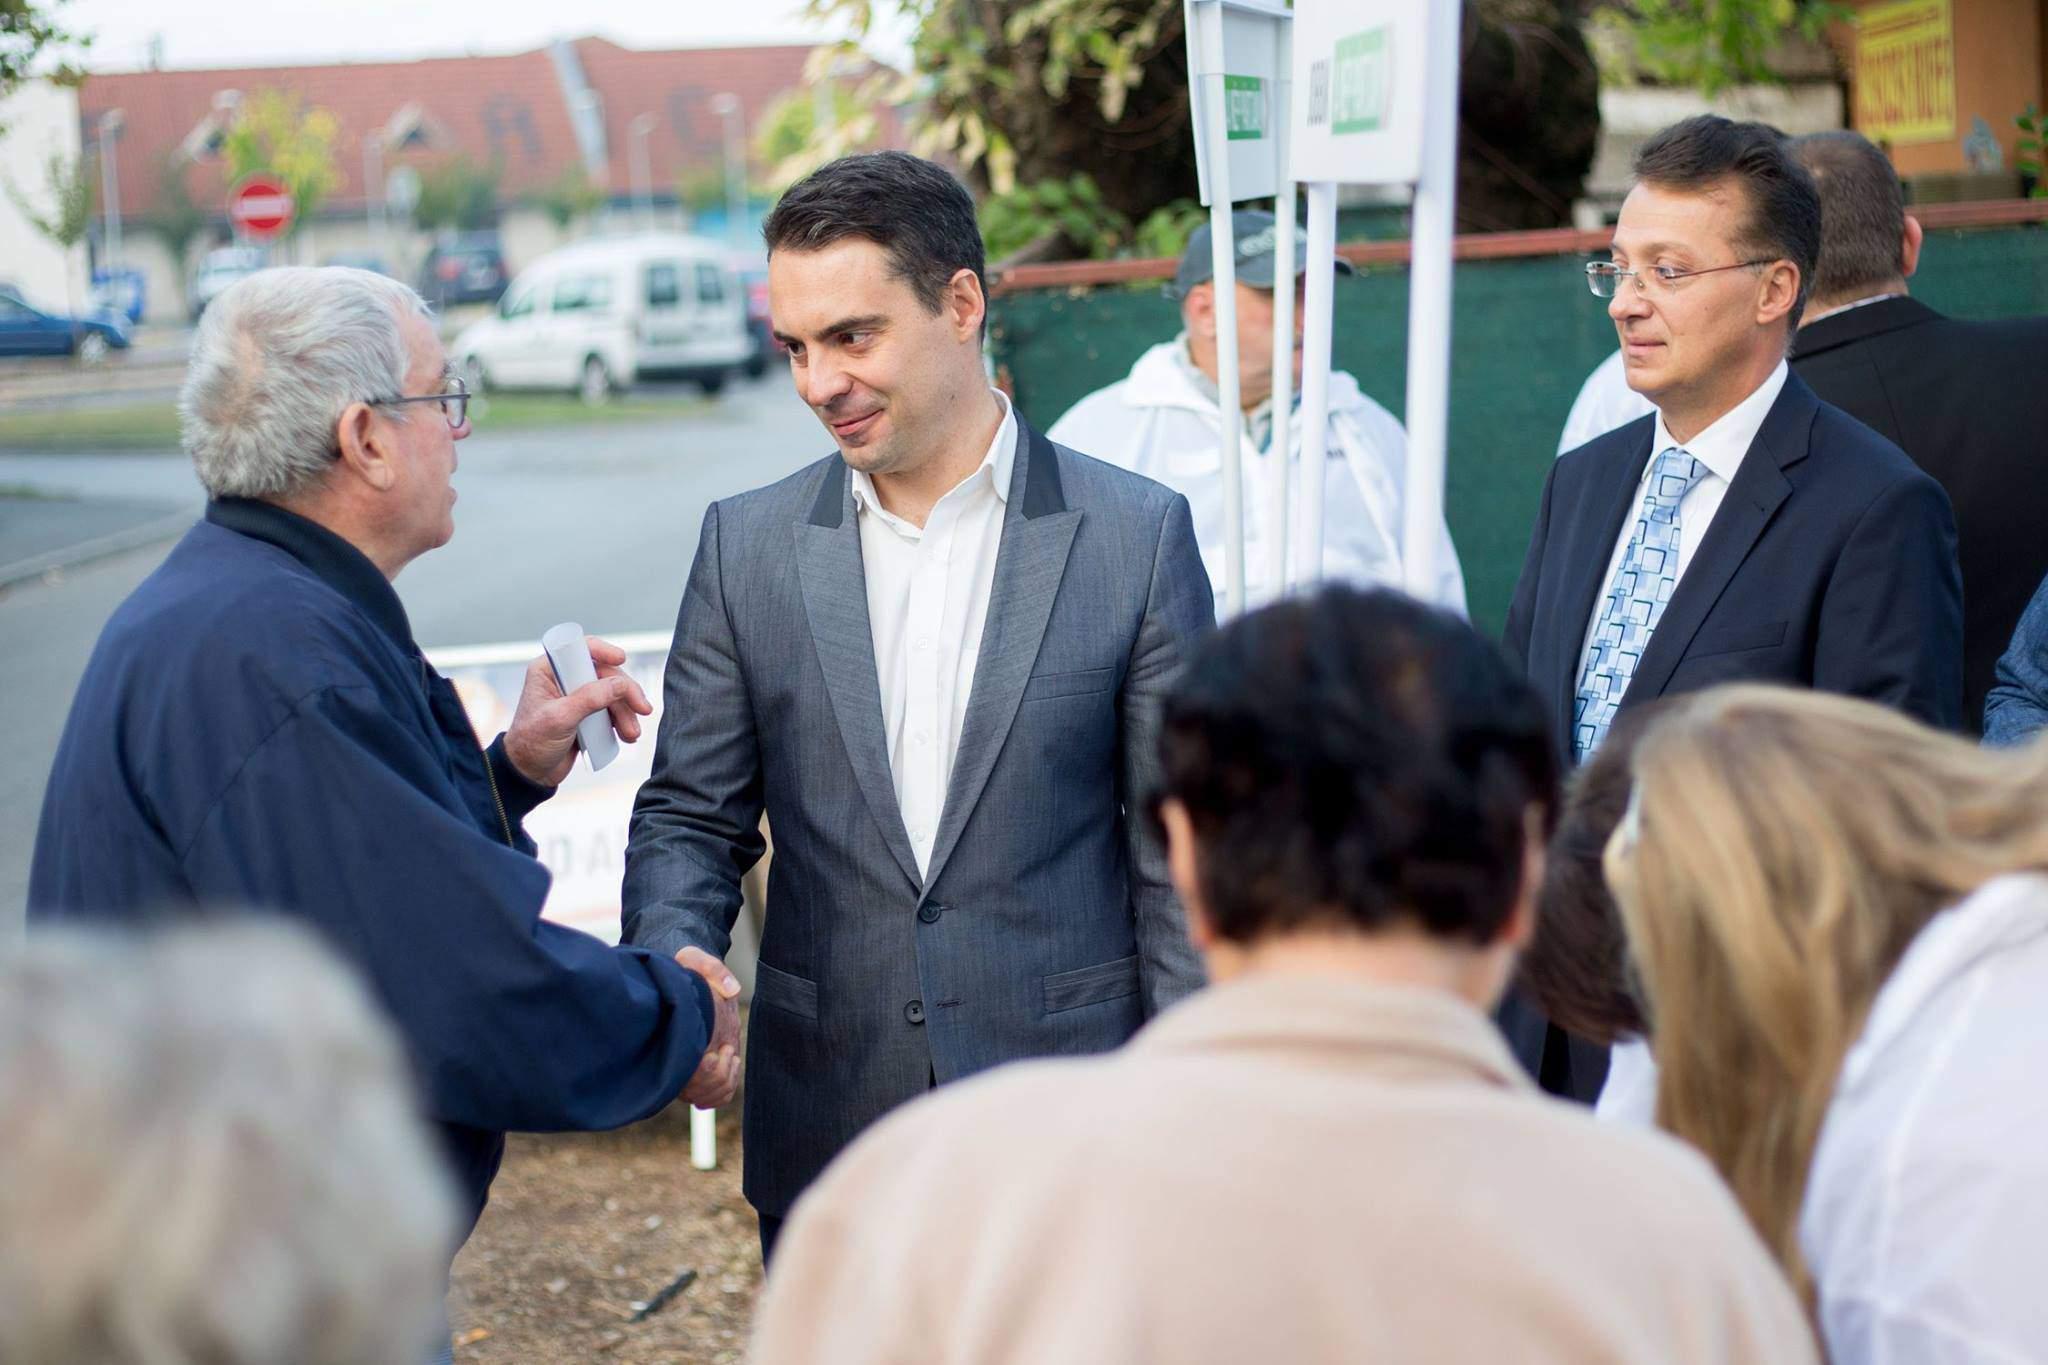 Jobbik party - Gábor Vona